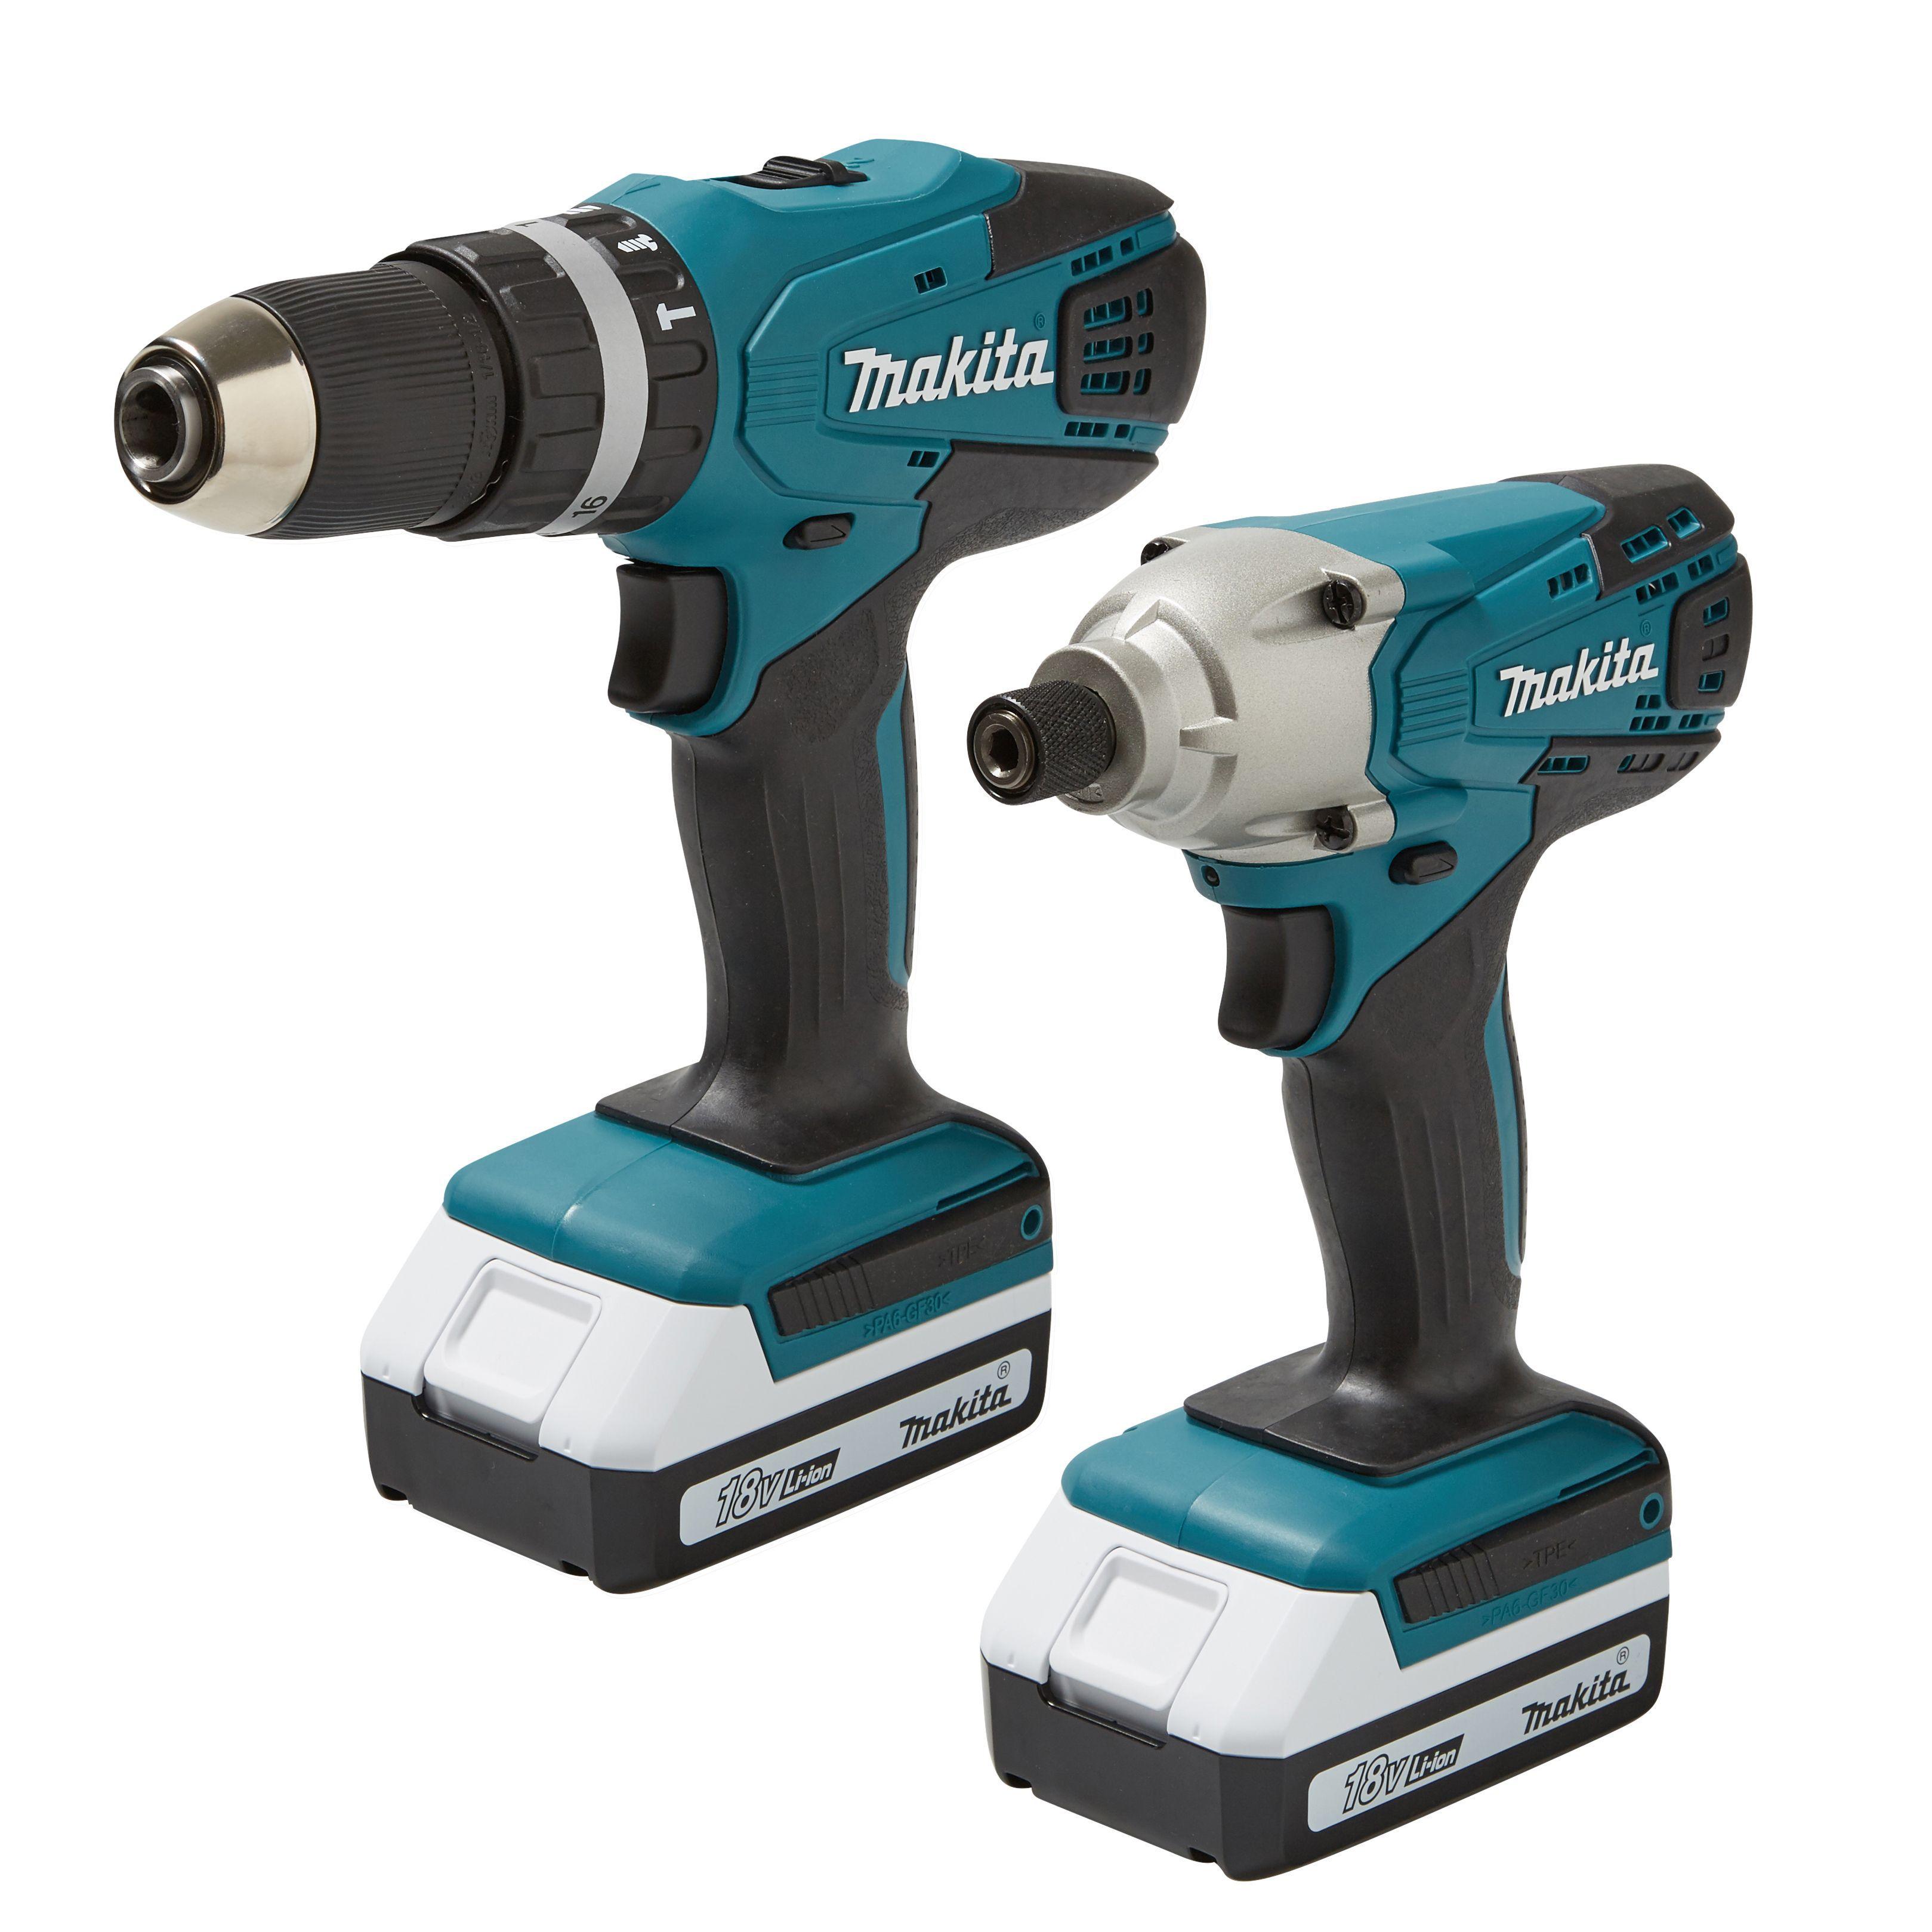 Makita 1.3ah Li-ion Combi Drill & Impact Driver Twin Pack 2 Batteries Dk18015x2